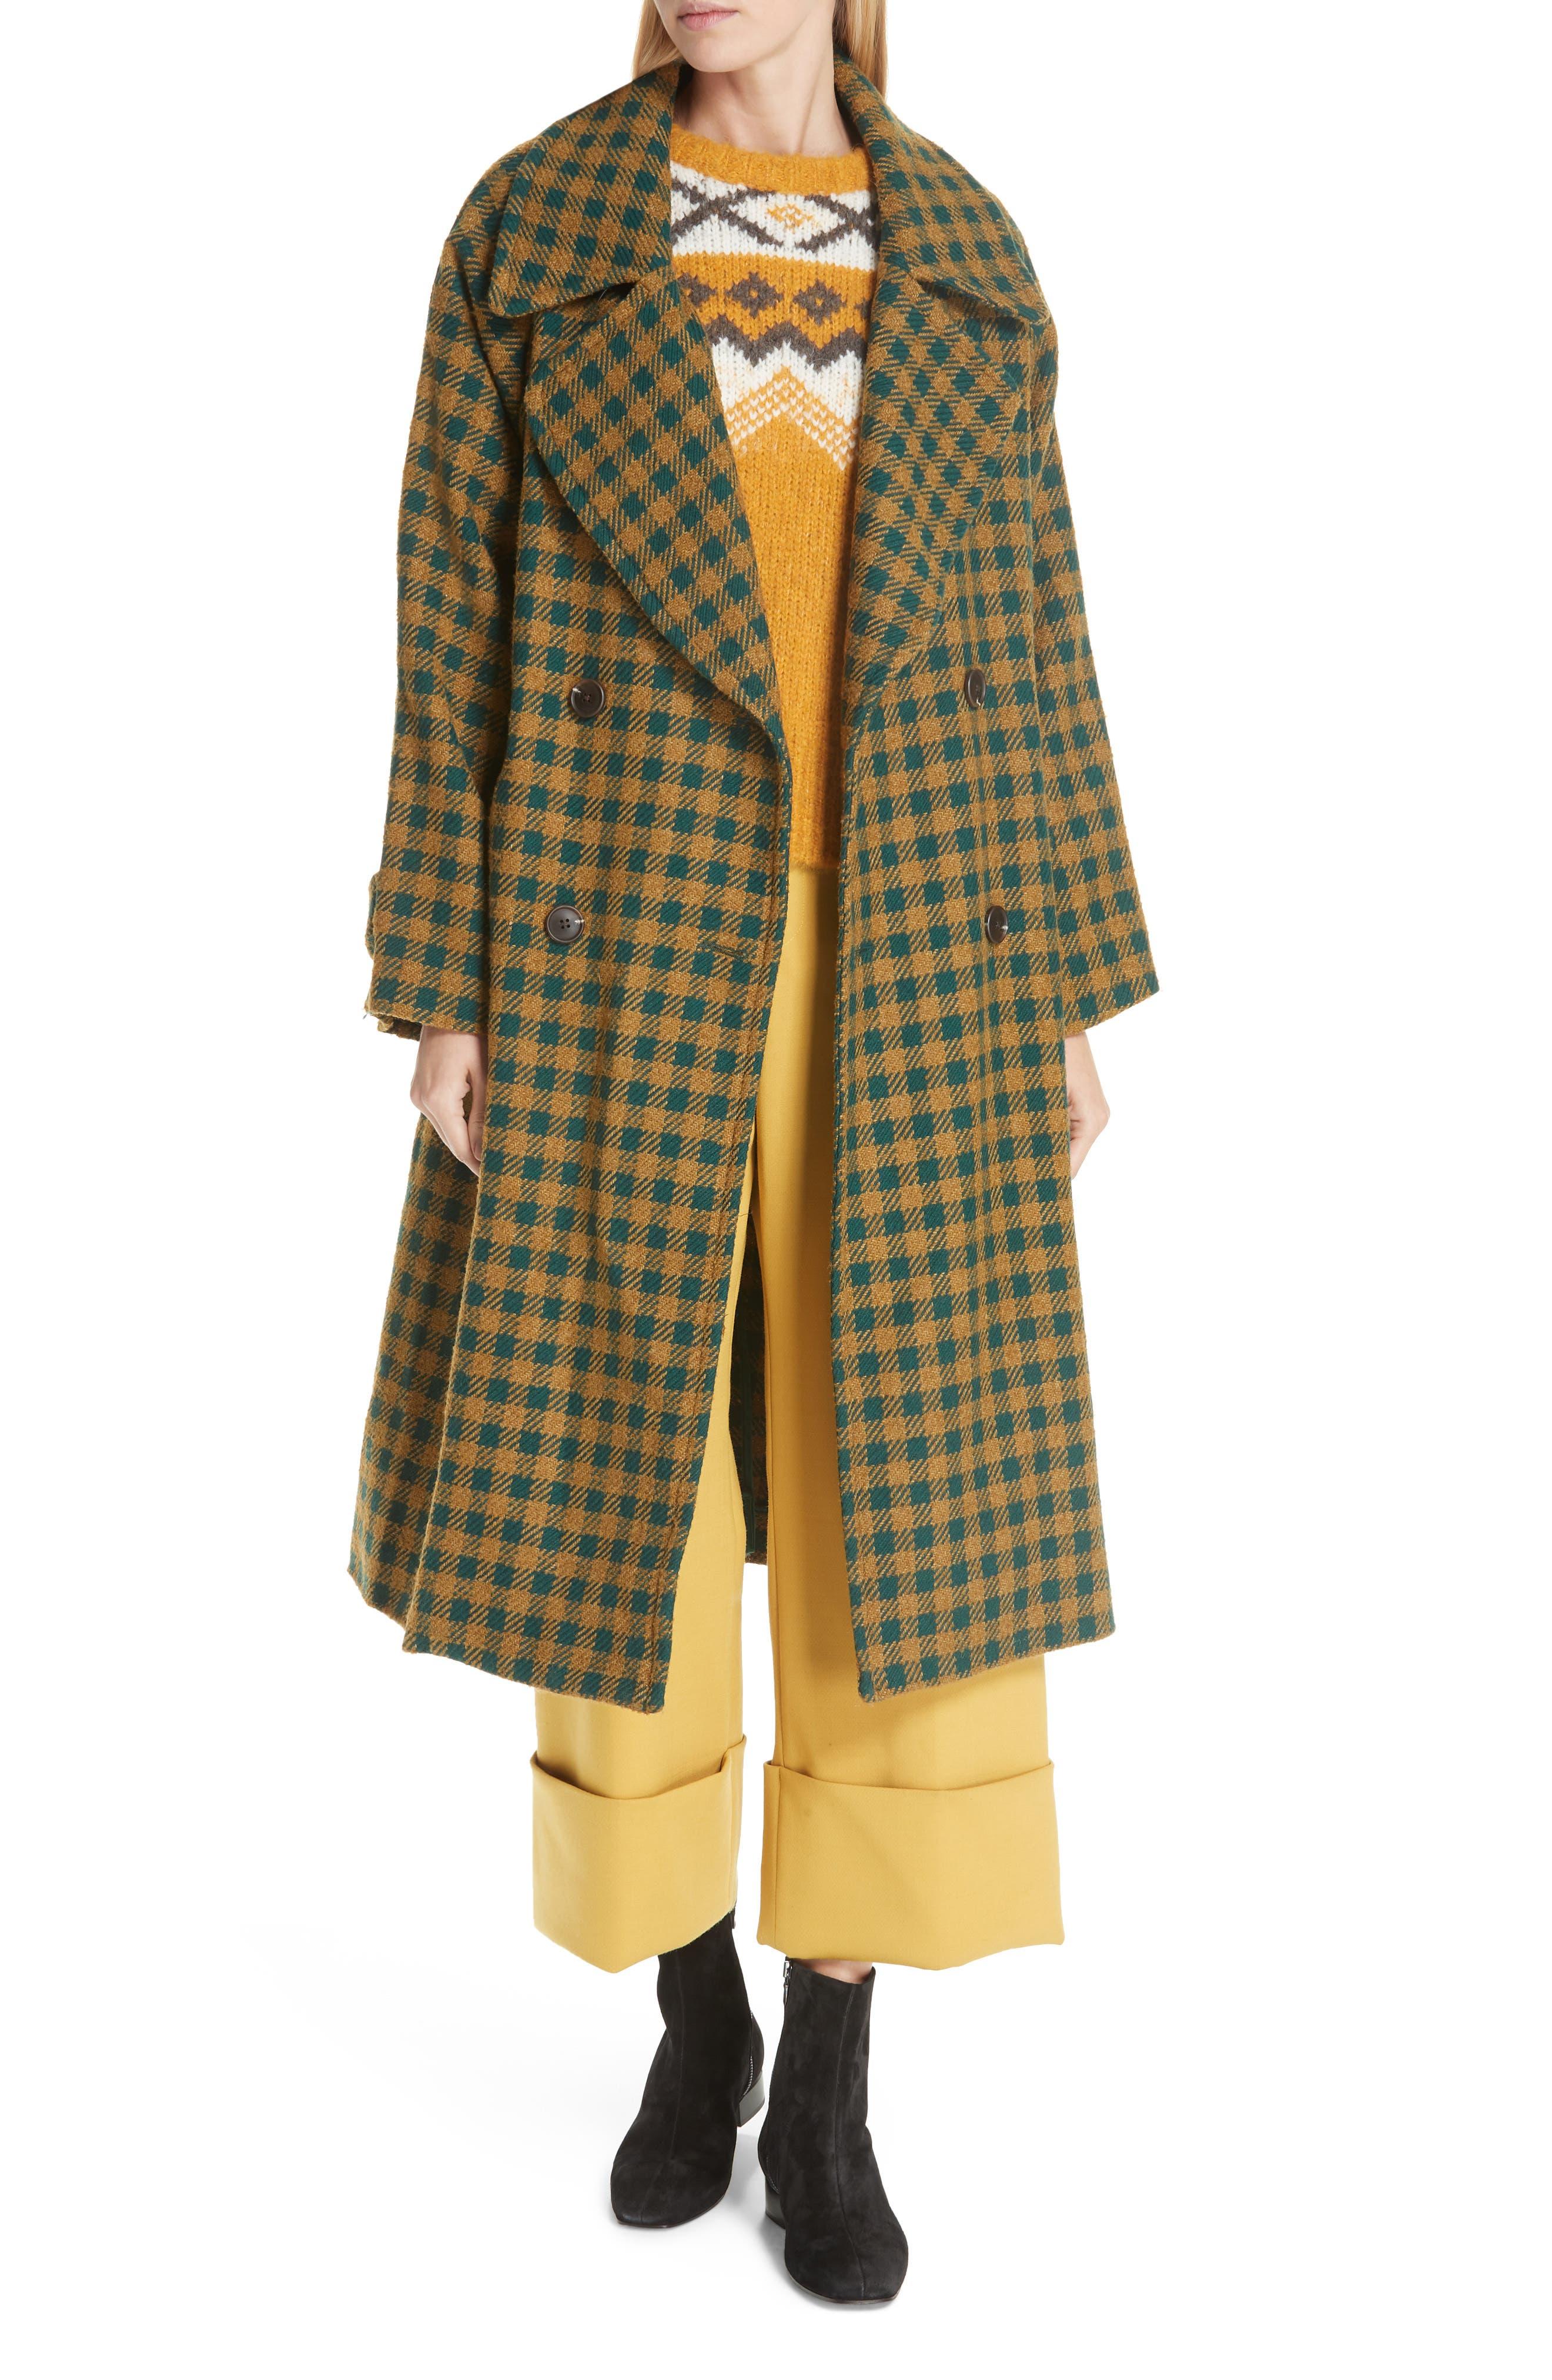 1940s Coats & Jackets Fashion History Womens Sea Ethno Pop Check Boyfriend Coat $1,150.00 AT vintagedancer.com